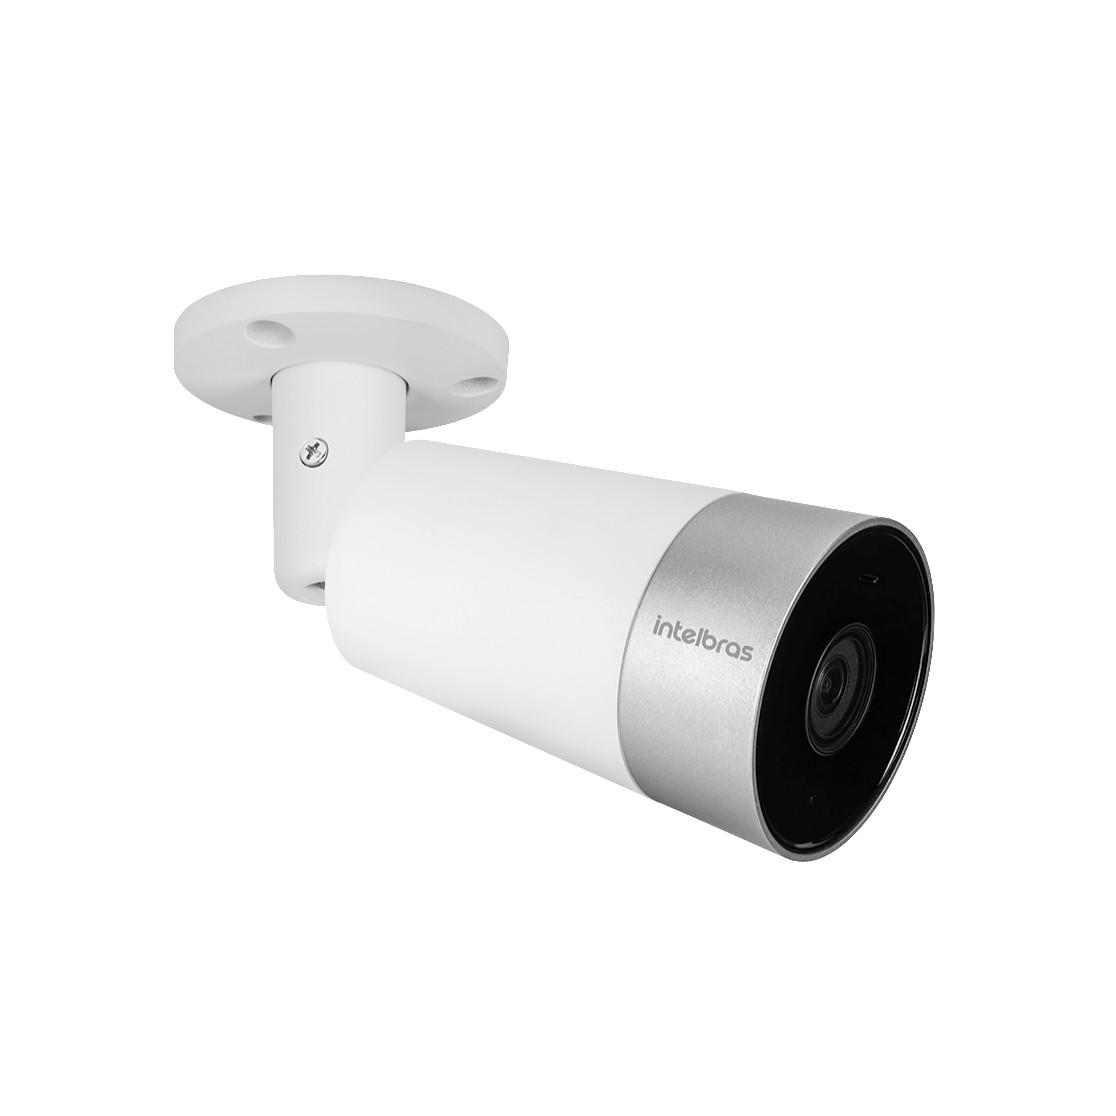 Camera de Seguranca Smart Intelbras Wifi Full HD Alexa e Google Assistente IP67 IM5 Branca